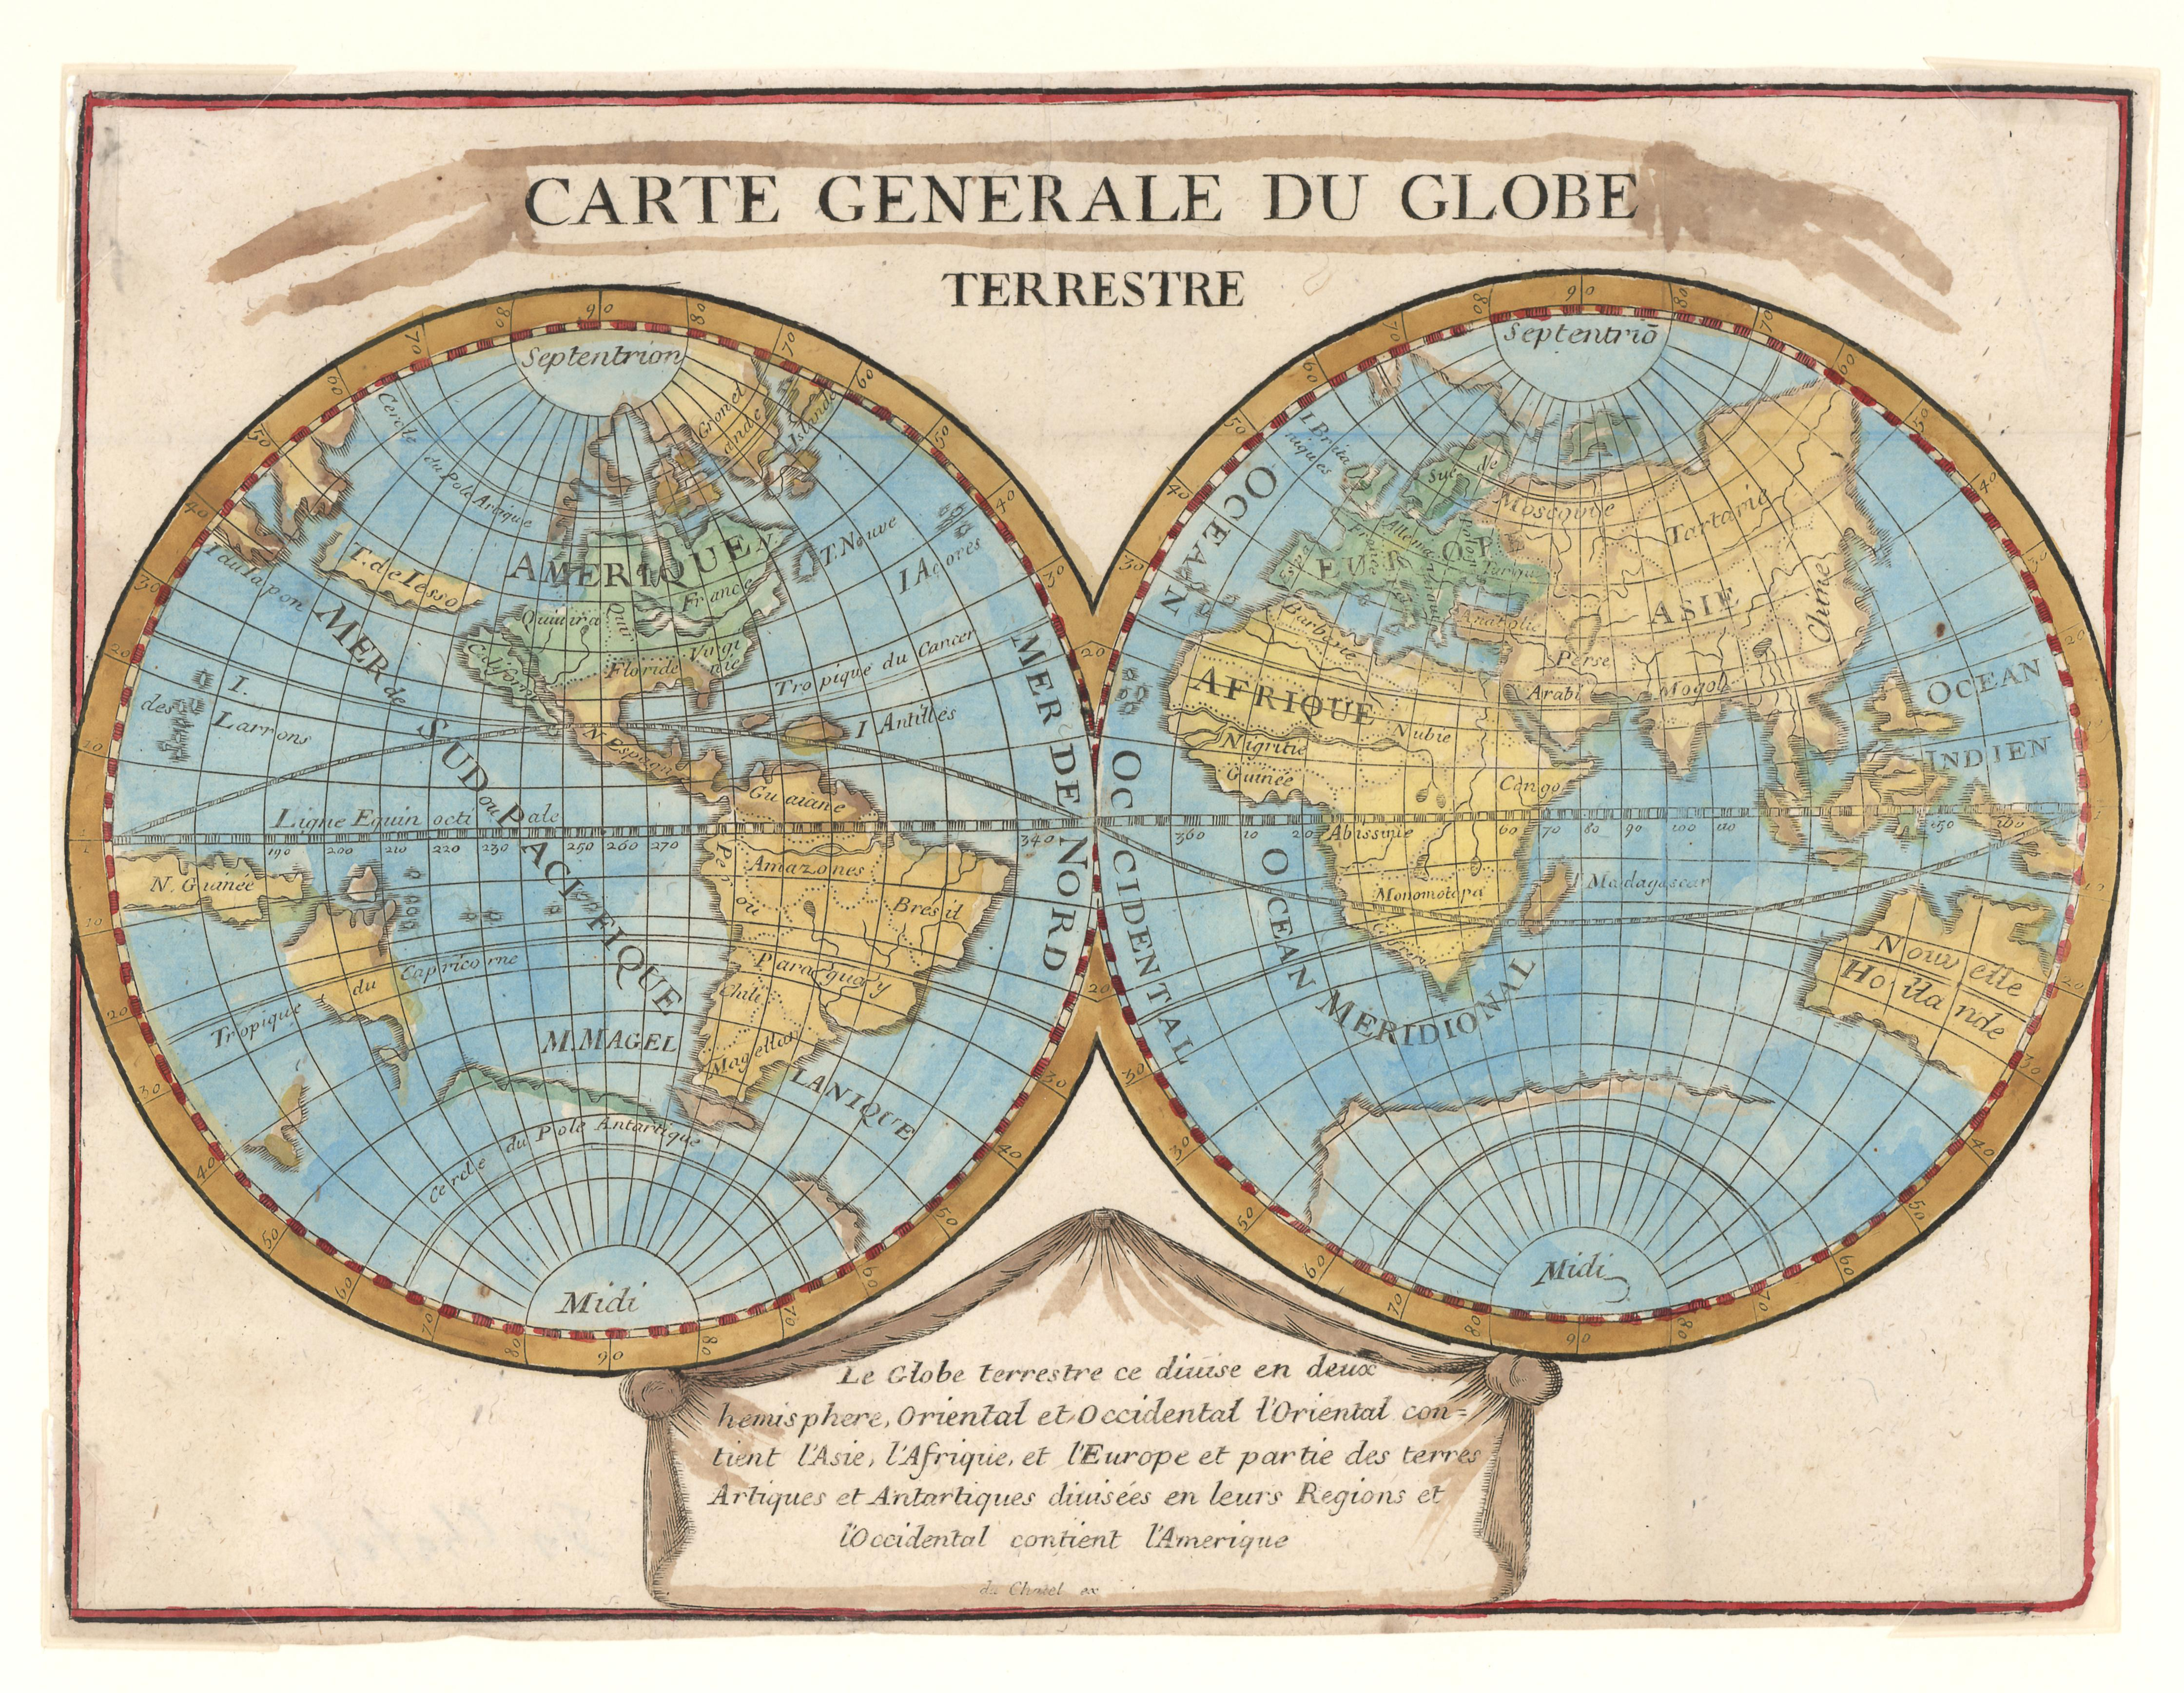 Carte General du Globe Terrestre